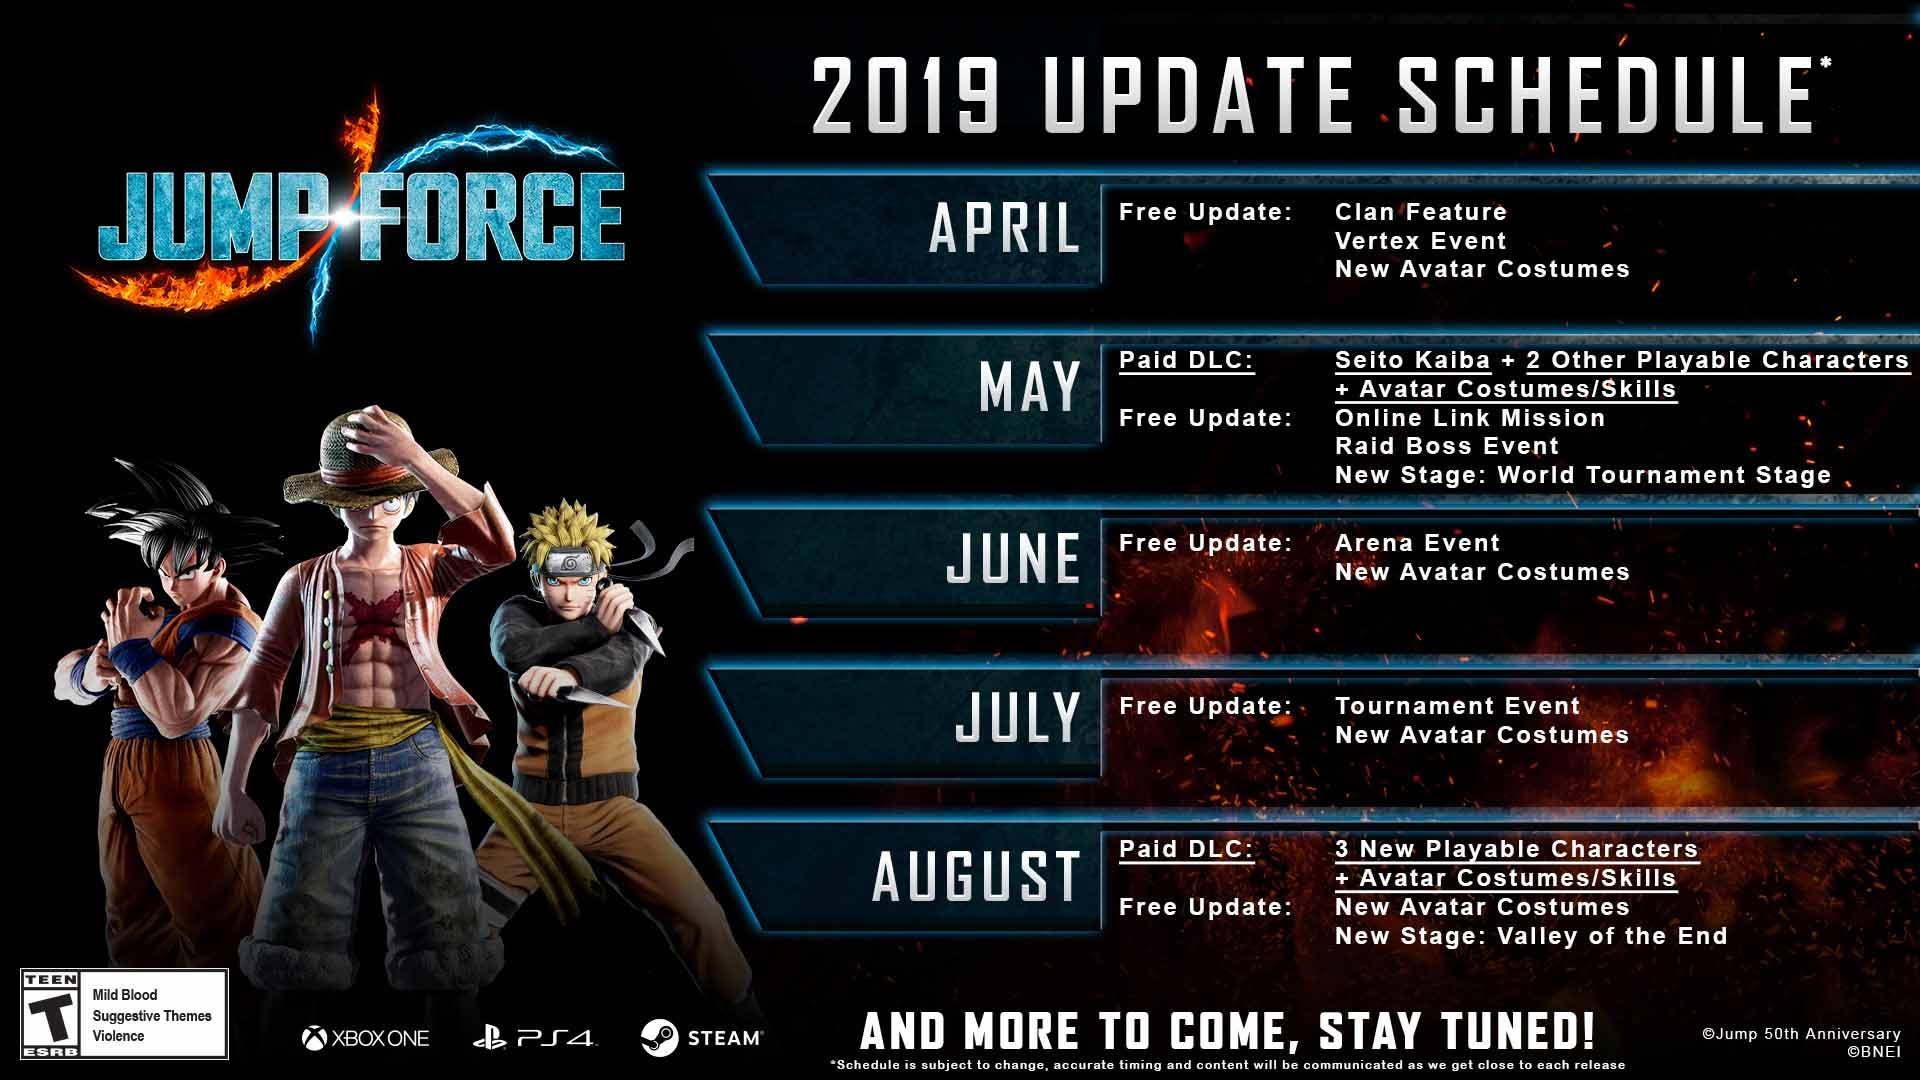 Majin Buu llegará a Jump Force vía DLC este verano